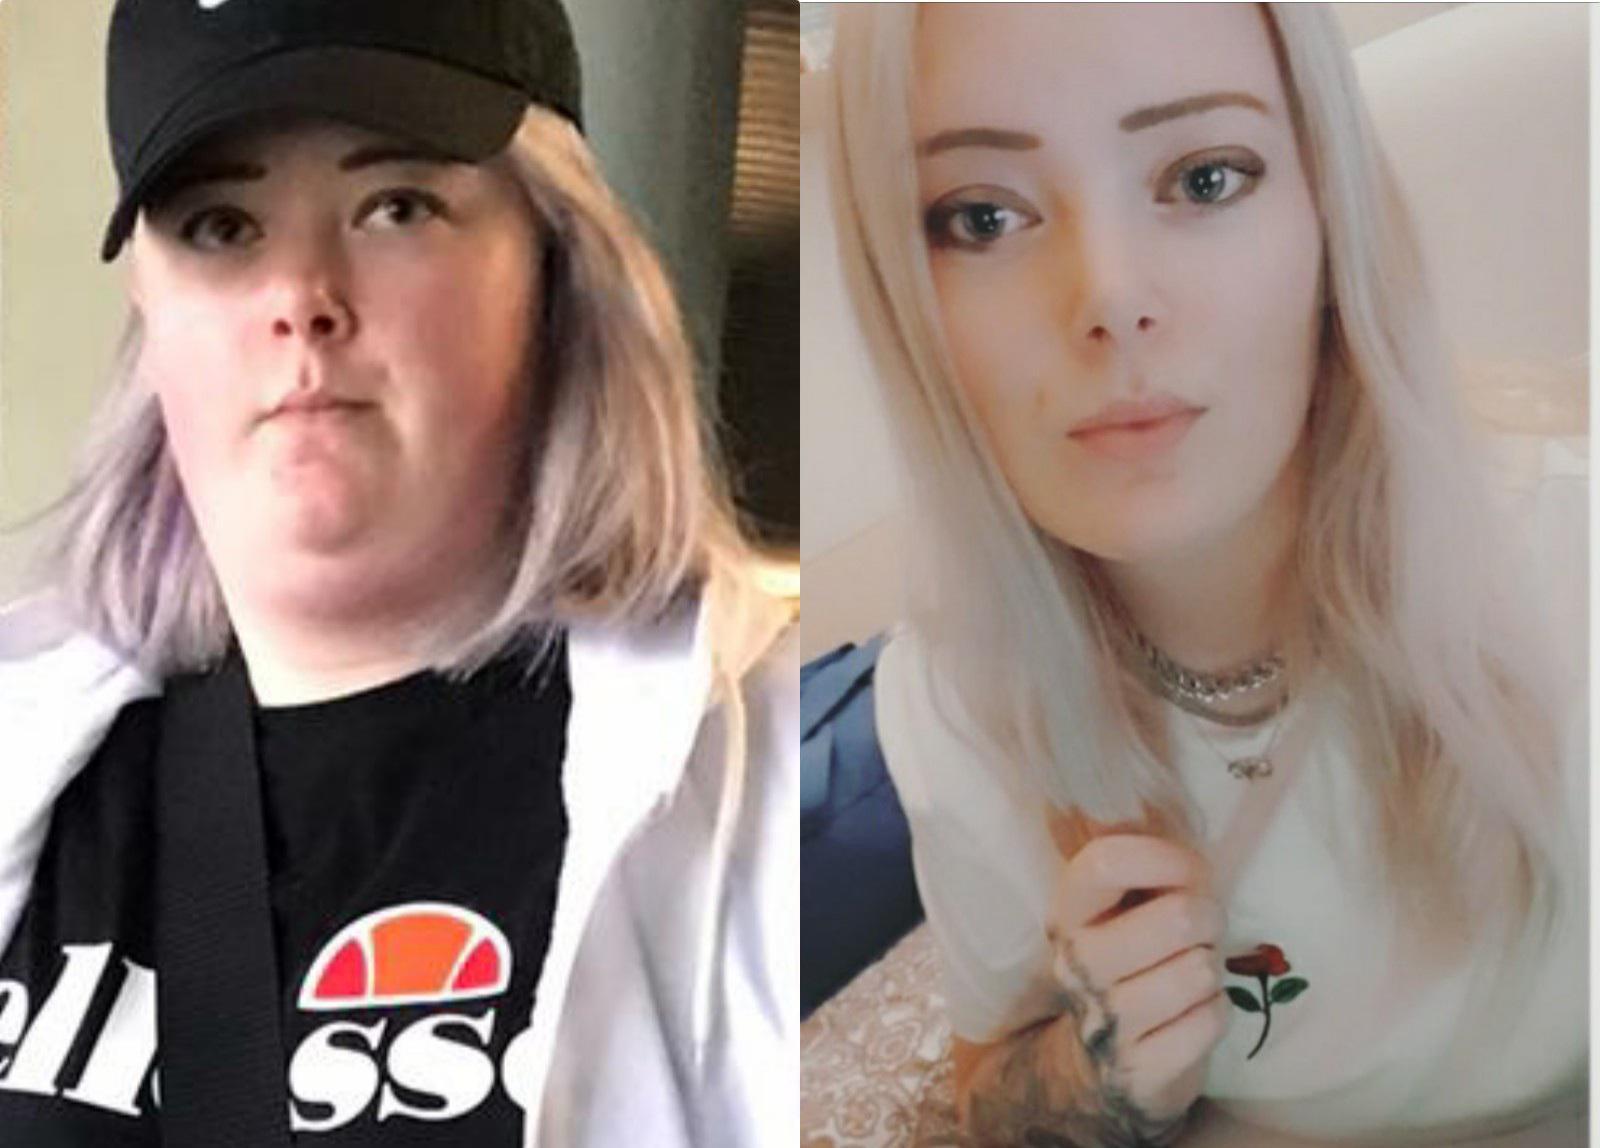 5 feet 4 Female Progress Pics of 56 lbs Weight Loss 227 lbs to 171 lbs